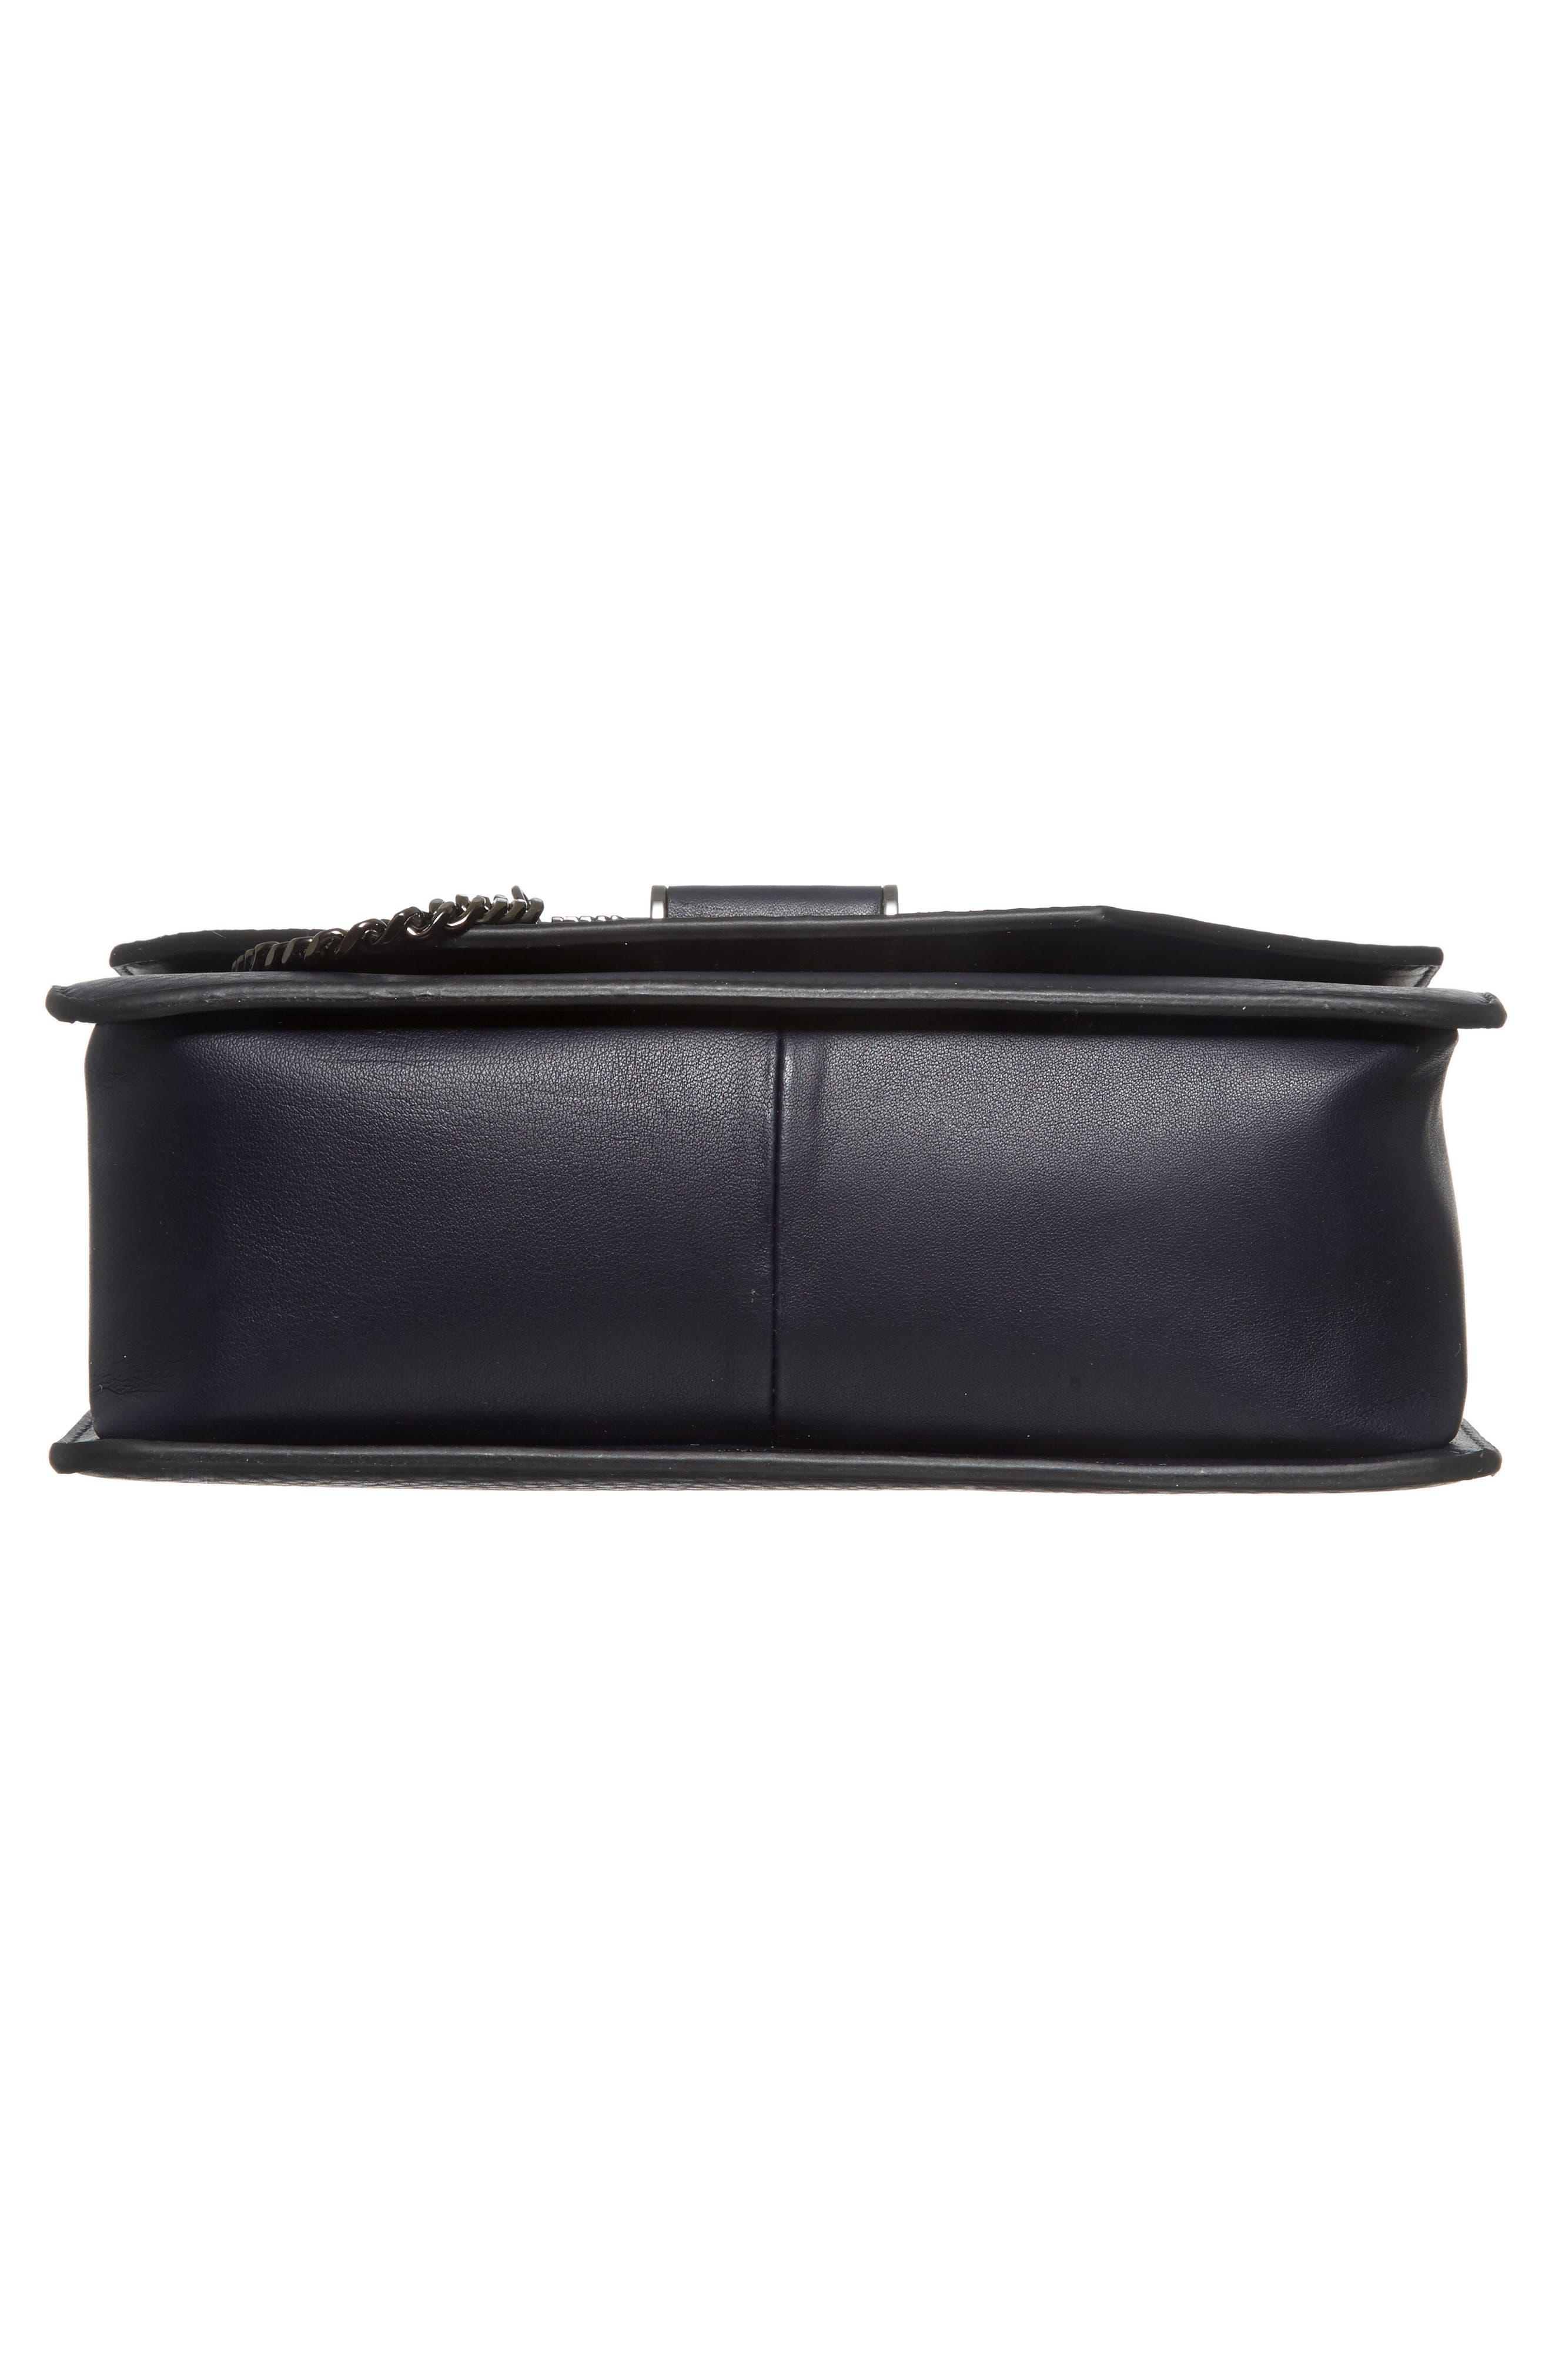 Cortney Nappa Leather Shoulder/Crossbody Bag,                             Alternate thumbnail 24, color,